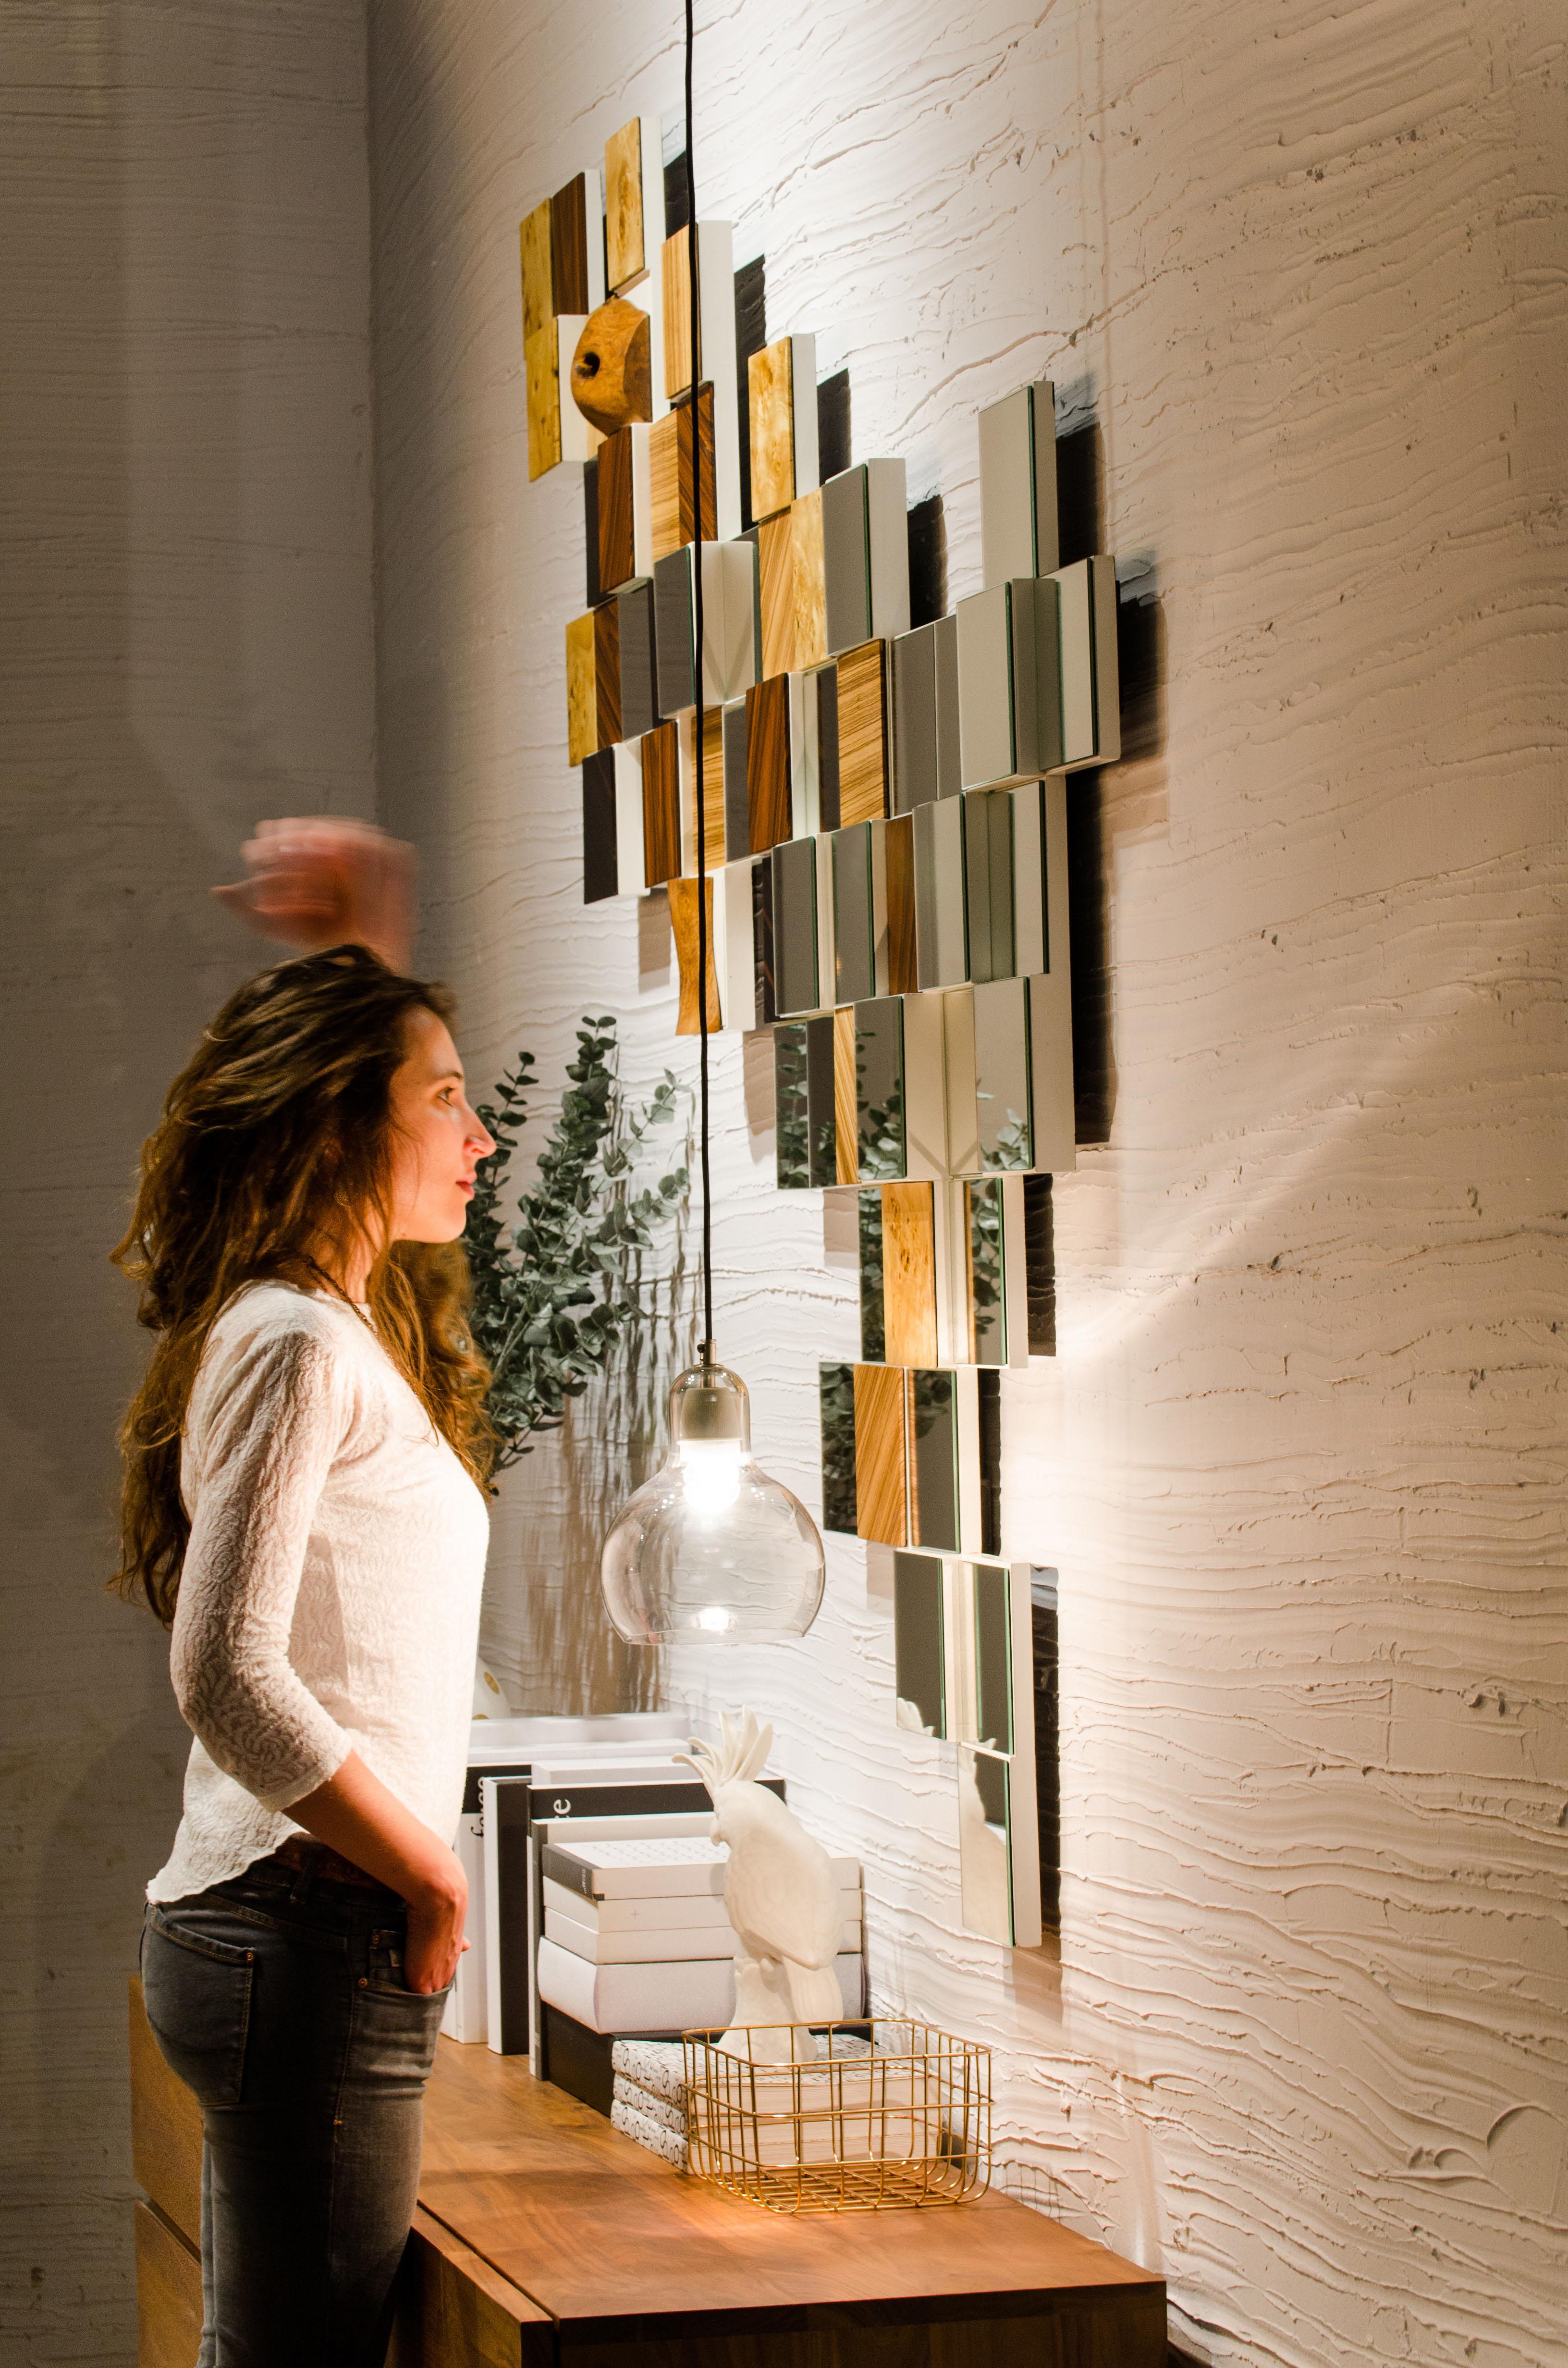 Collage-Mirror-just3ds.com-5